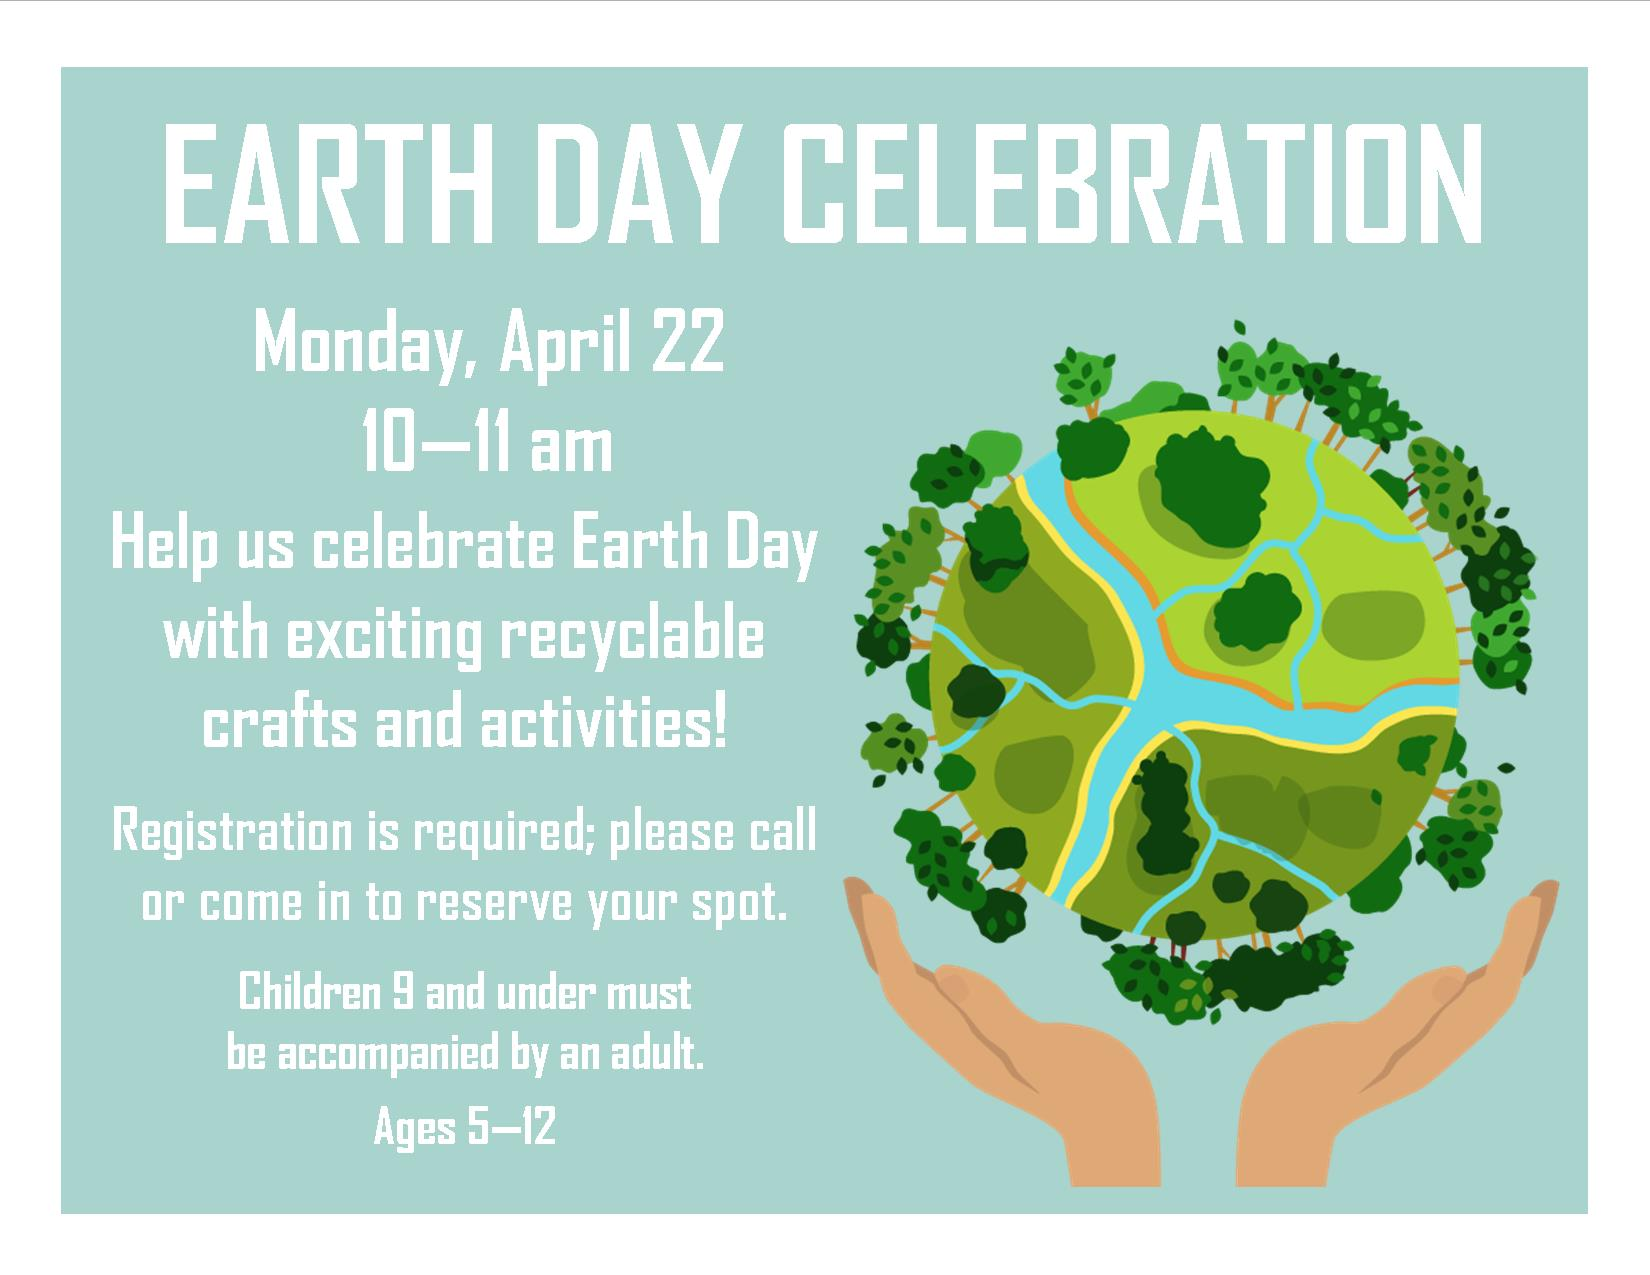 Earth Day Celebration.jpg